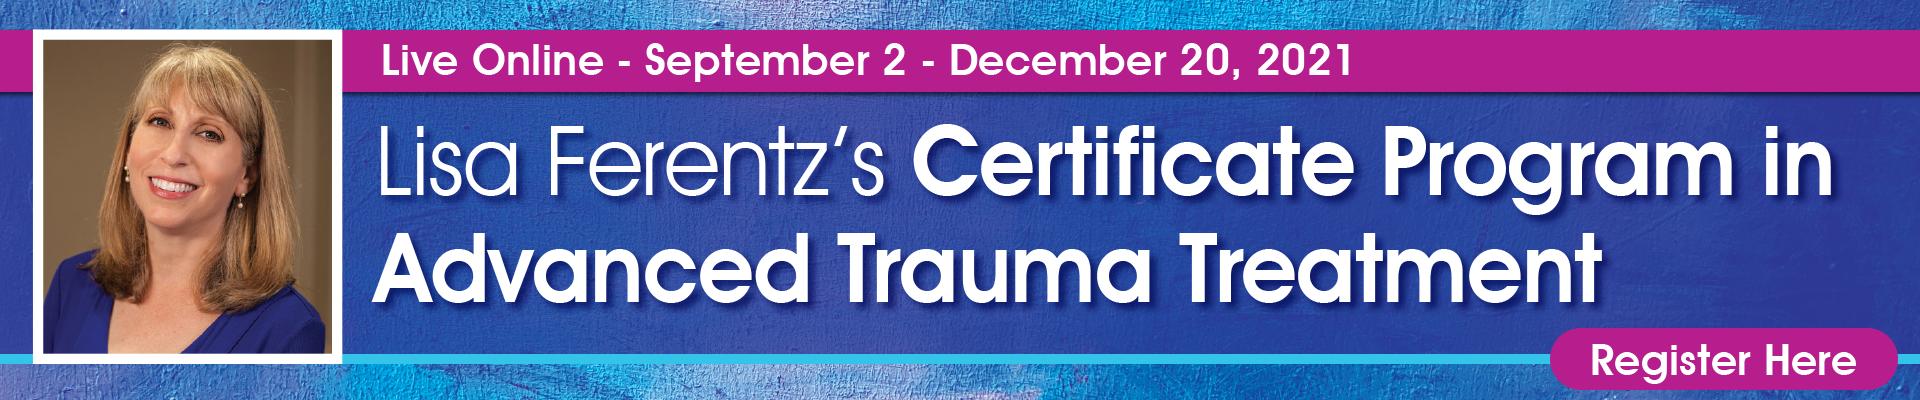 Lisa Ferentz's Certificate in Advanced Trauma Treatment